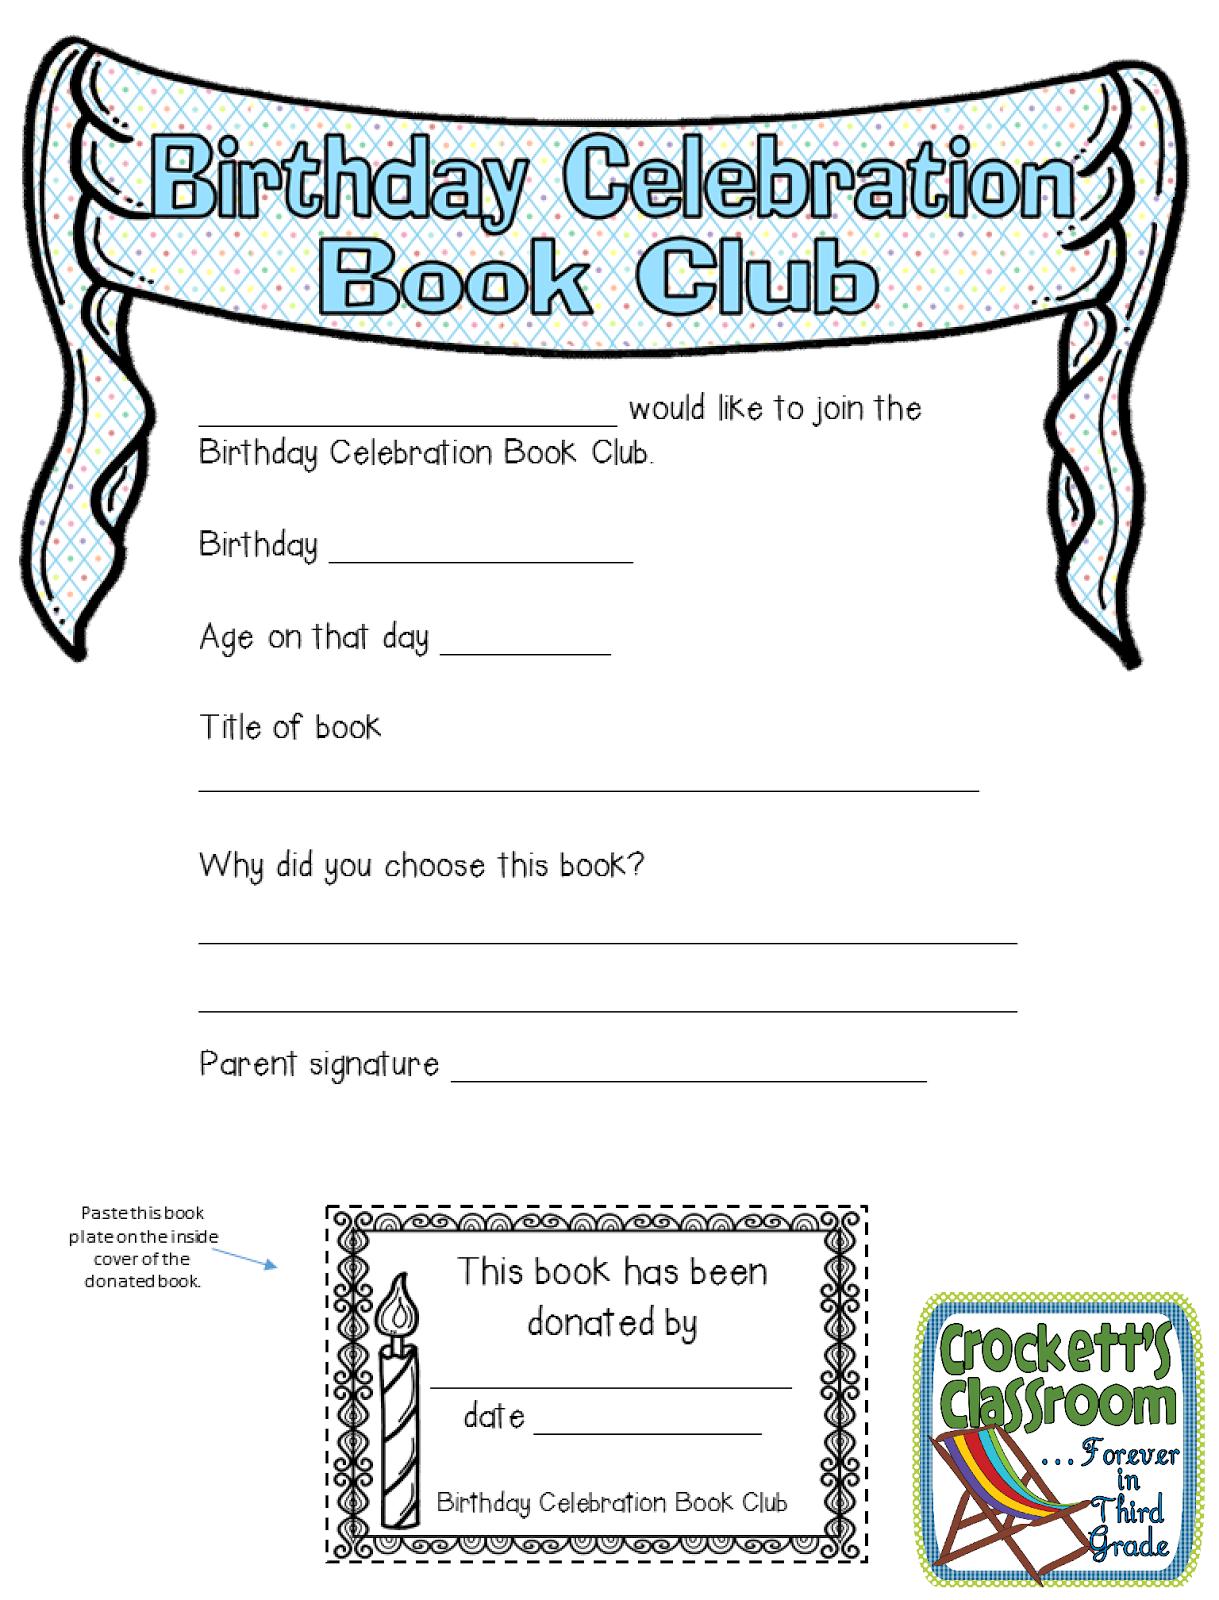 Birthday Celebration Book Club